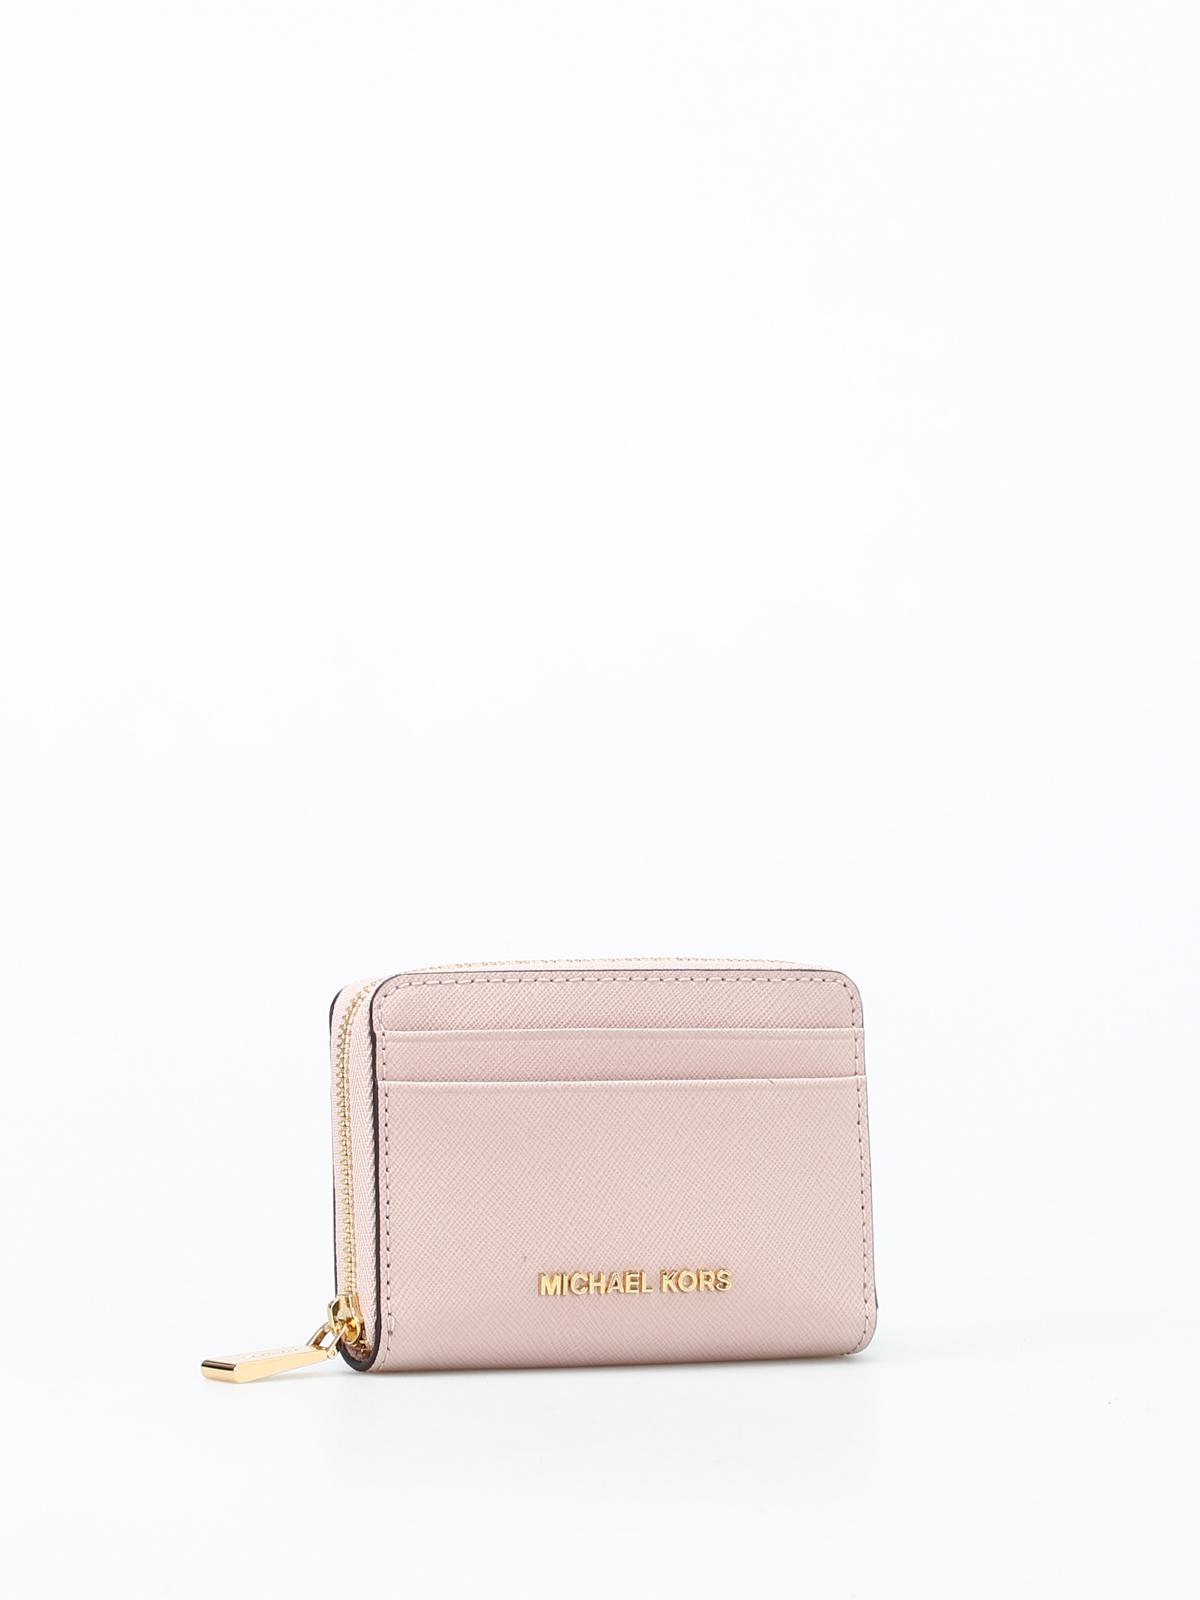 8743156995827f MICHAEL KORS: wallets & purses online - Money Pieces zip around card case